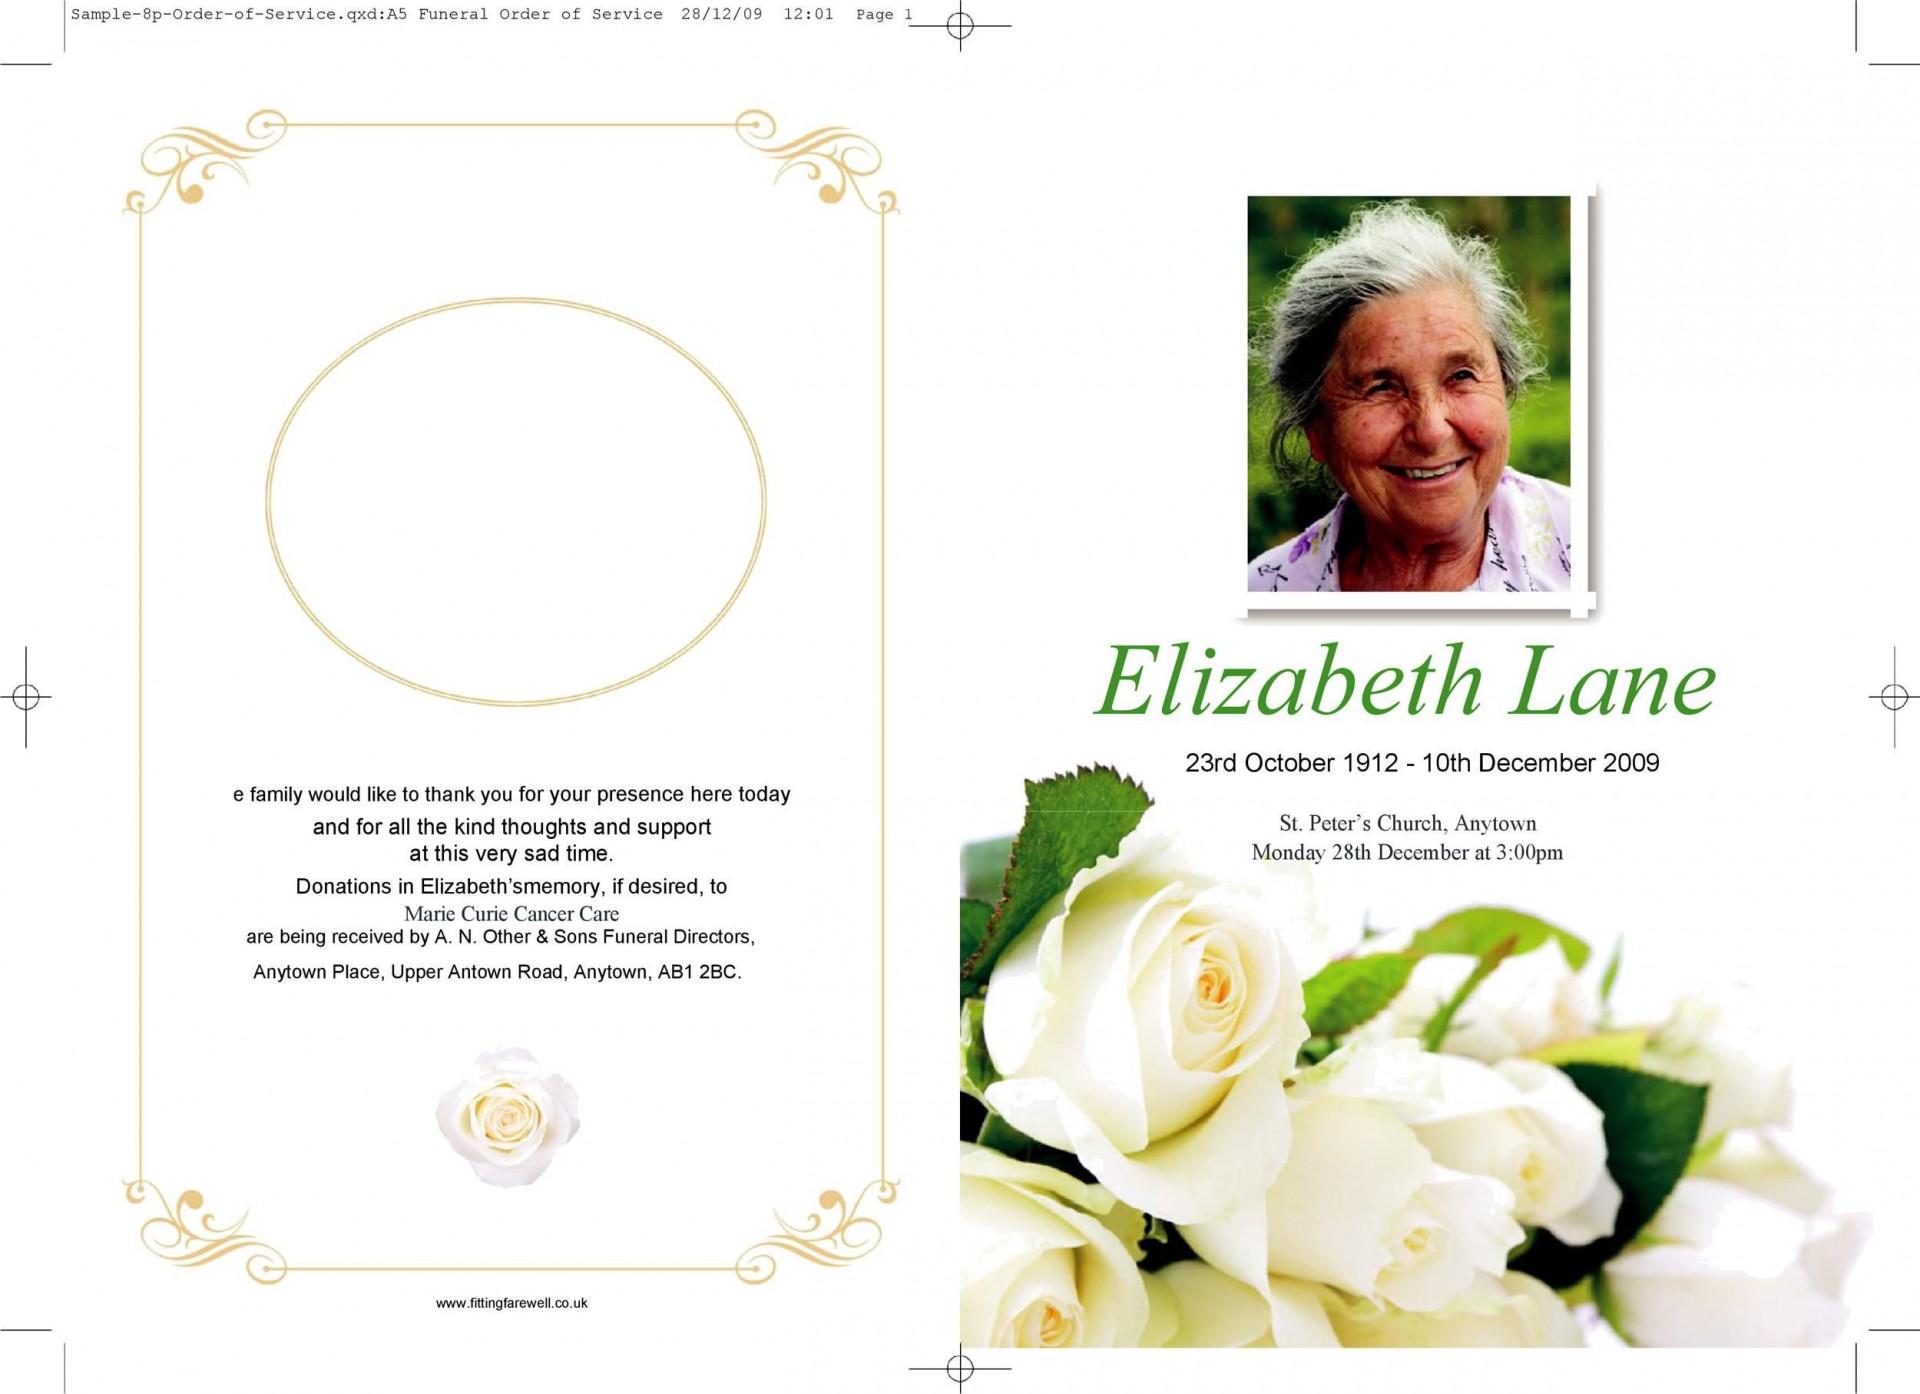 008 Phenomenal Template For Funeral Program Free Idea  Printable Download On Word Editable Pdf1920